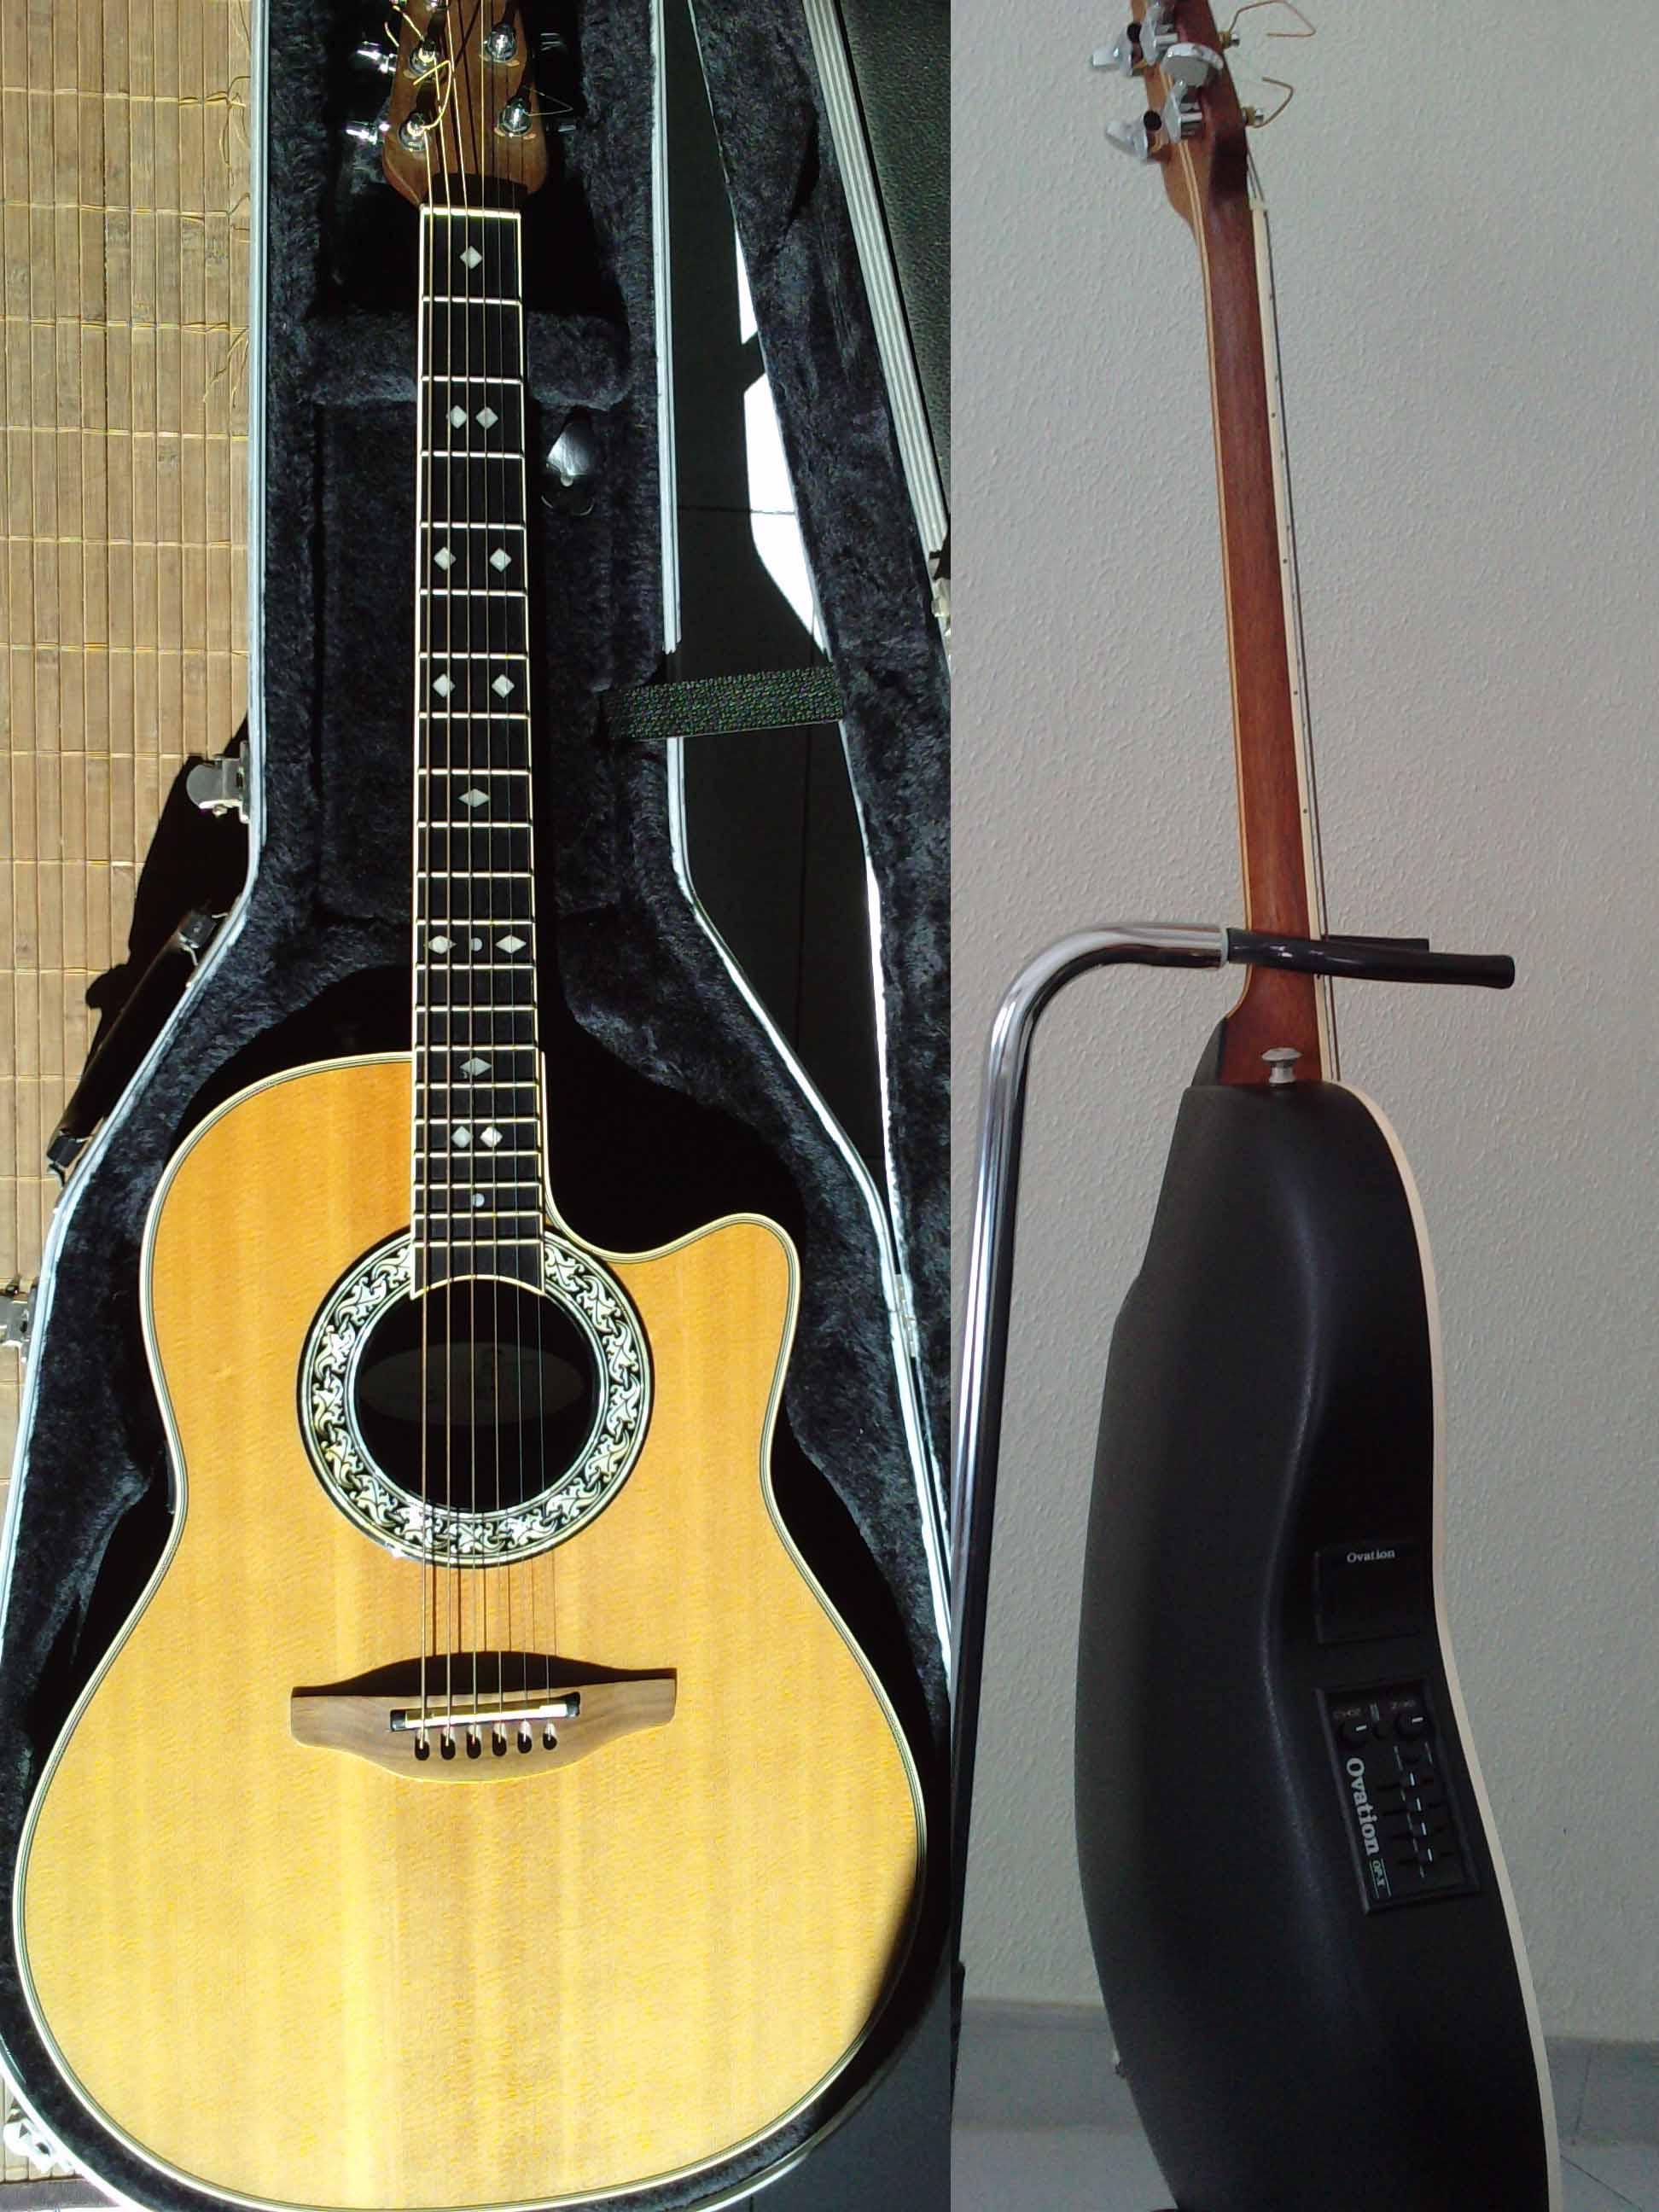 OVATION - Legend 1867 - Clases de Guitarra Barcelona